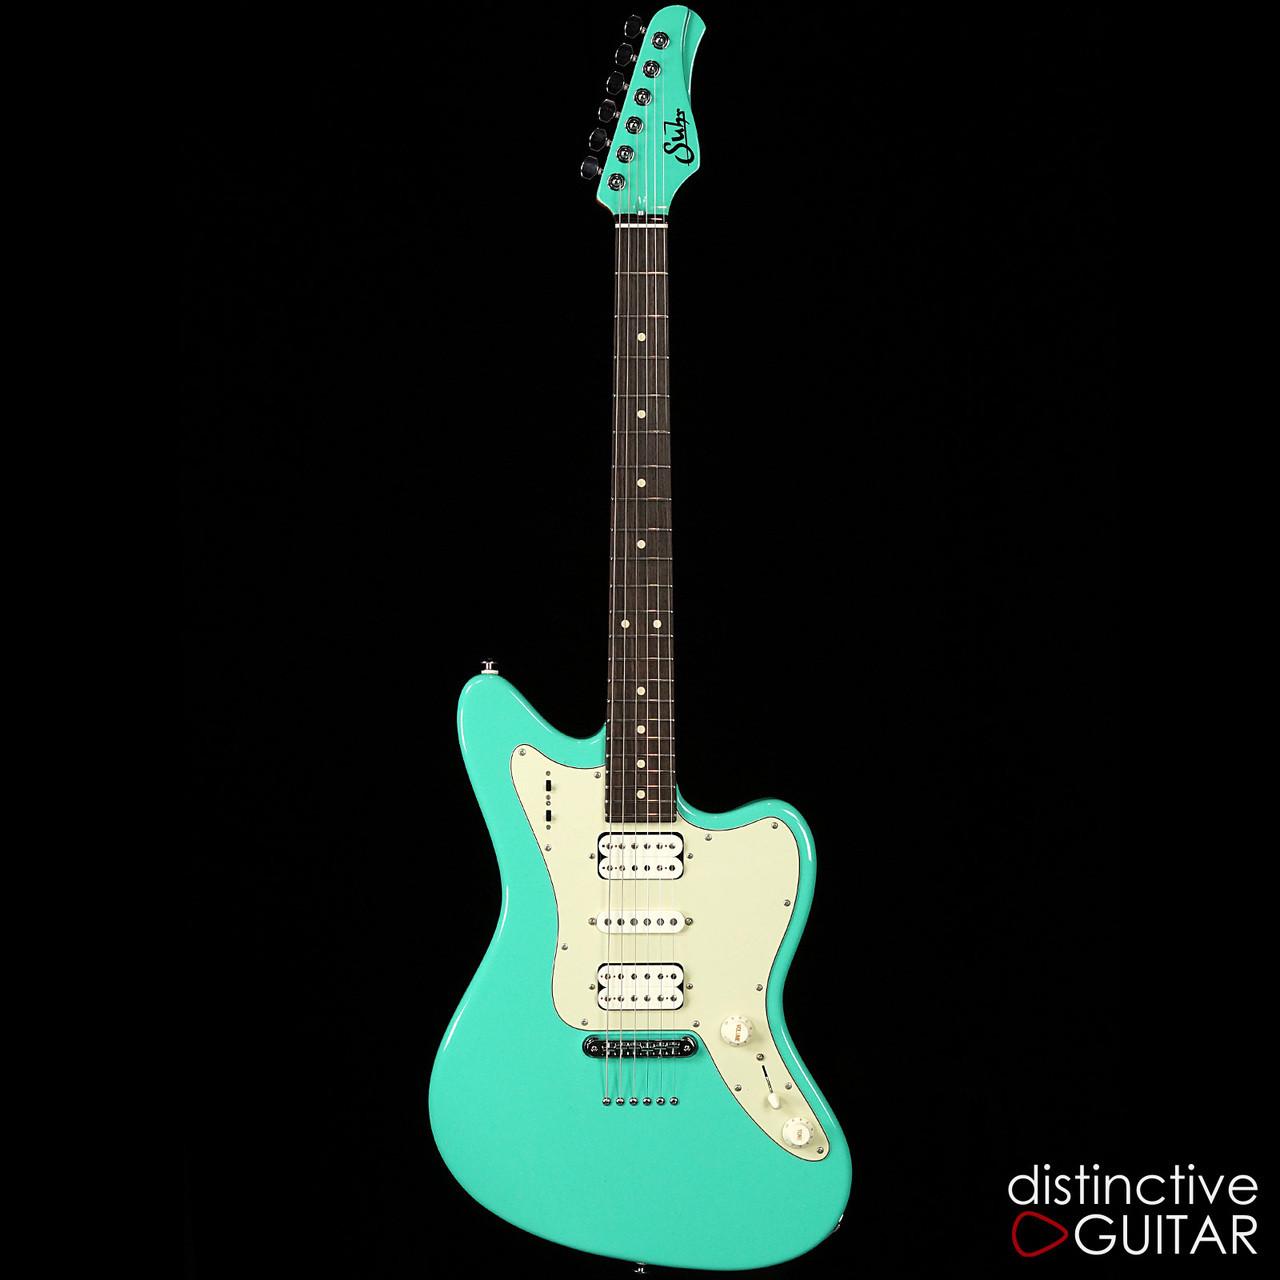 Suhr Ssv Wiring Diagram Electrical Diagrams Guitars Classic Jm Ian Thornley Signature Series Seafoam Green Js9a4c Fishman